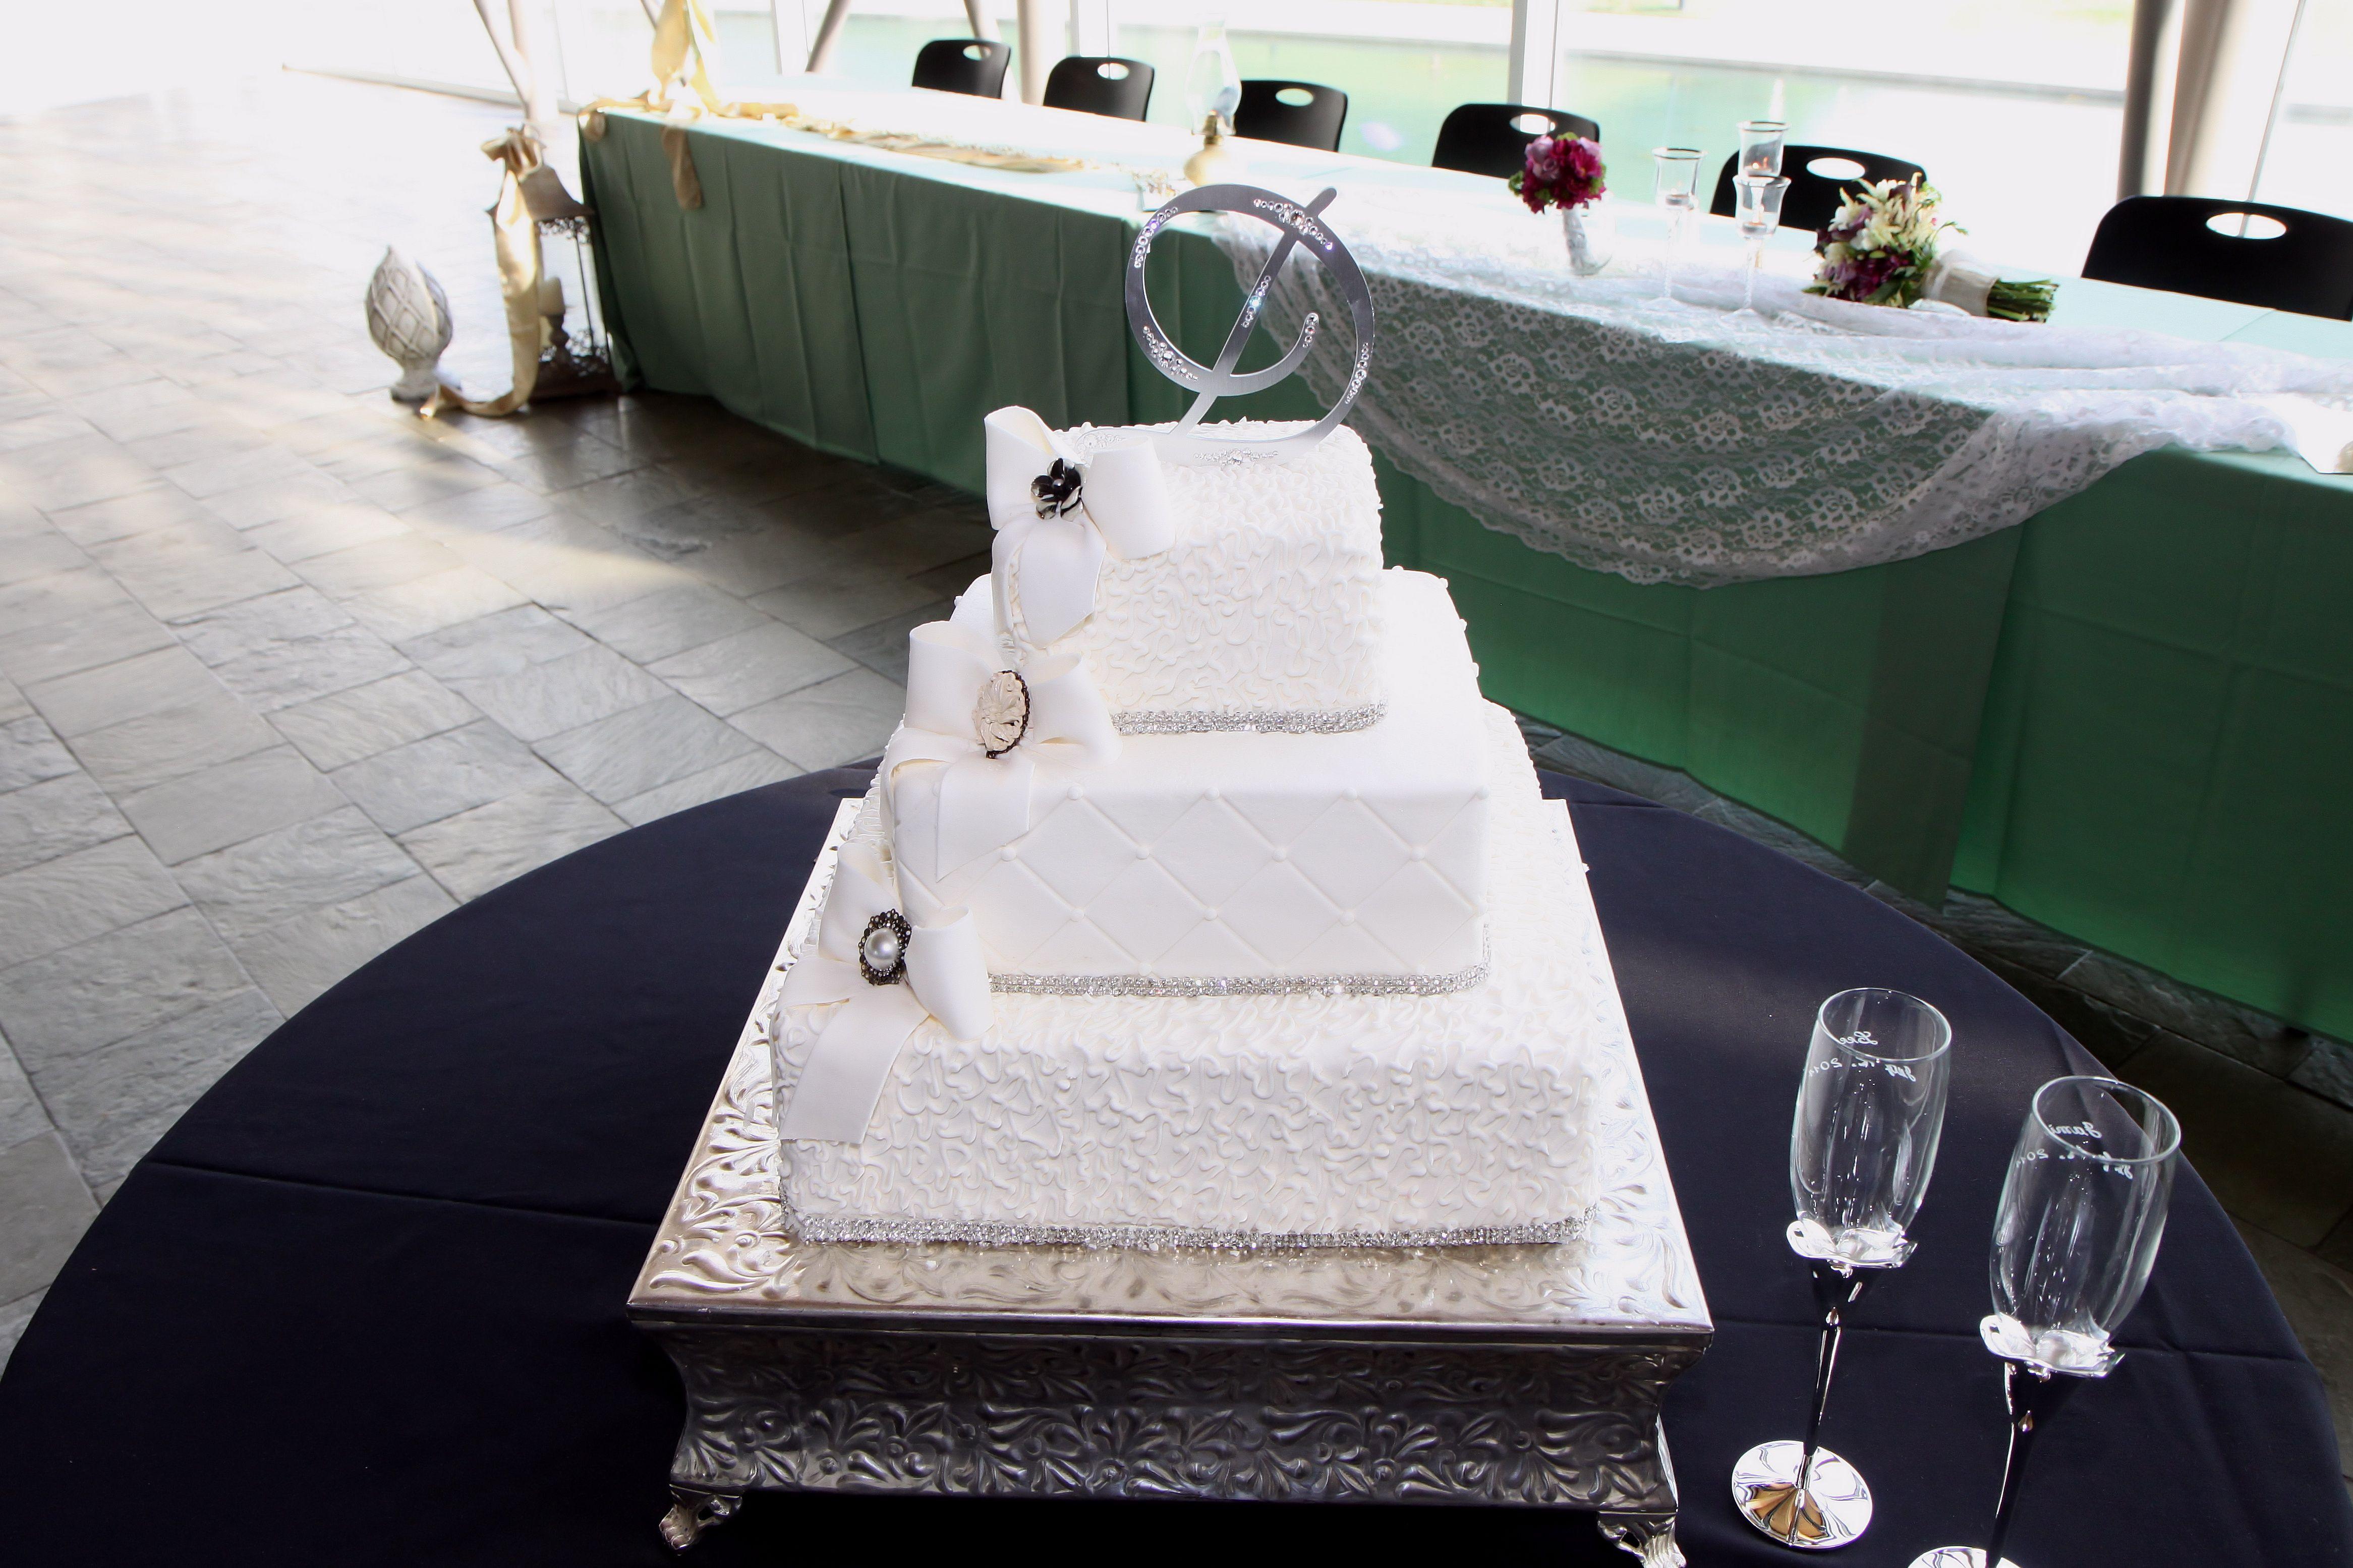 Wedding Cakes Wichita Ks  Wedding Cakes Wichita Ks Wedding graphy